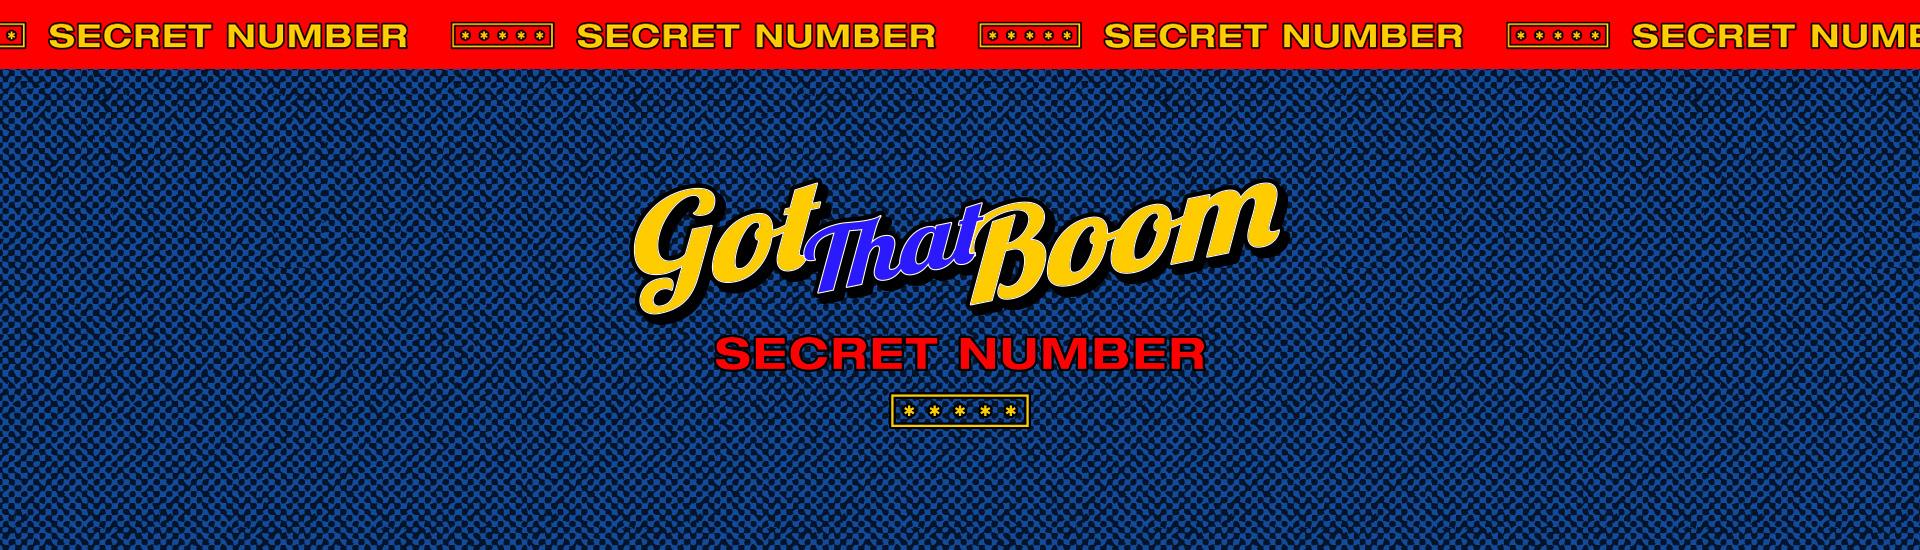 SECRET NUMBER - Global Video Call Event